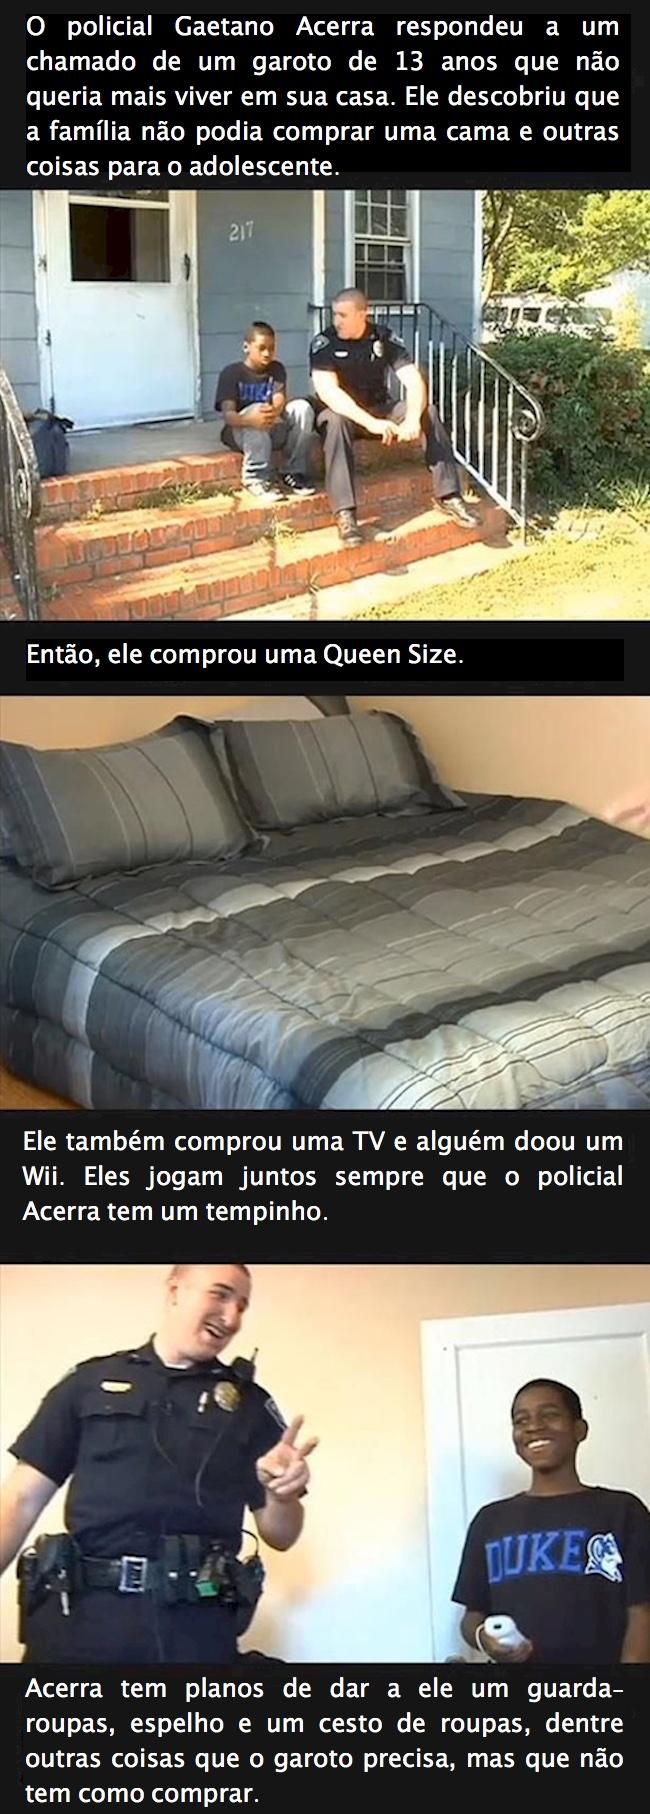 boas_acoes11